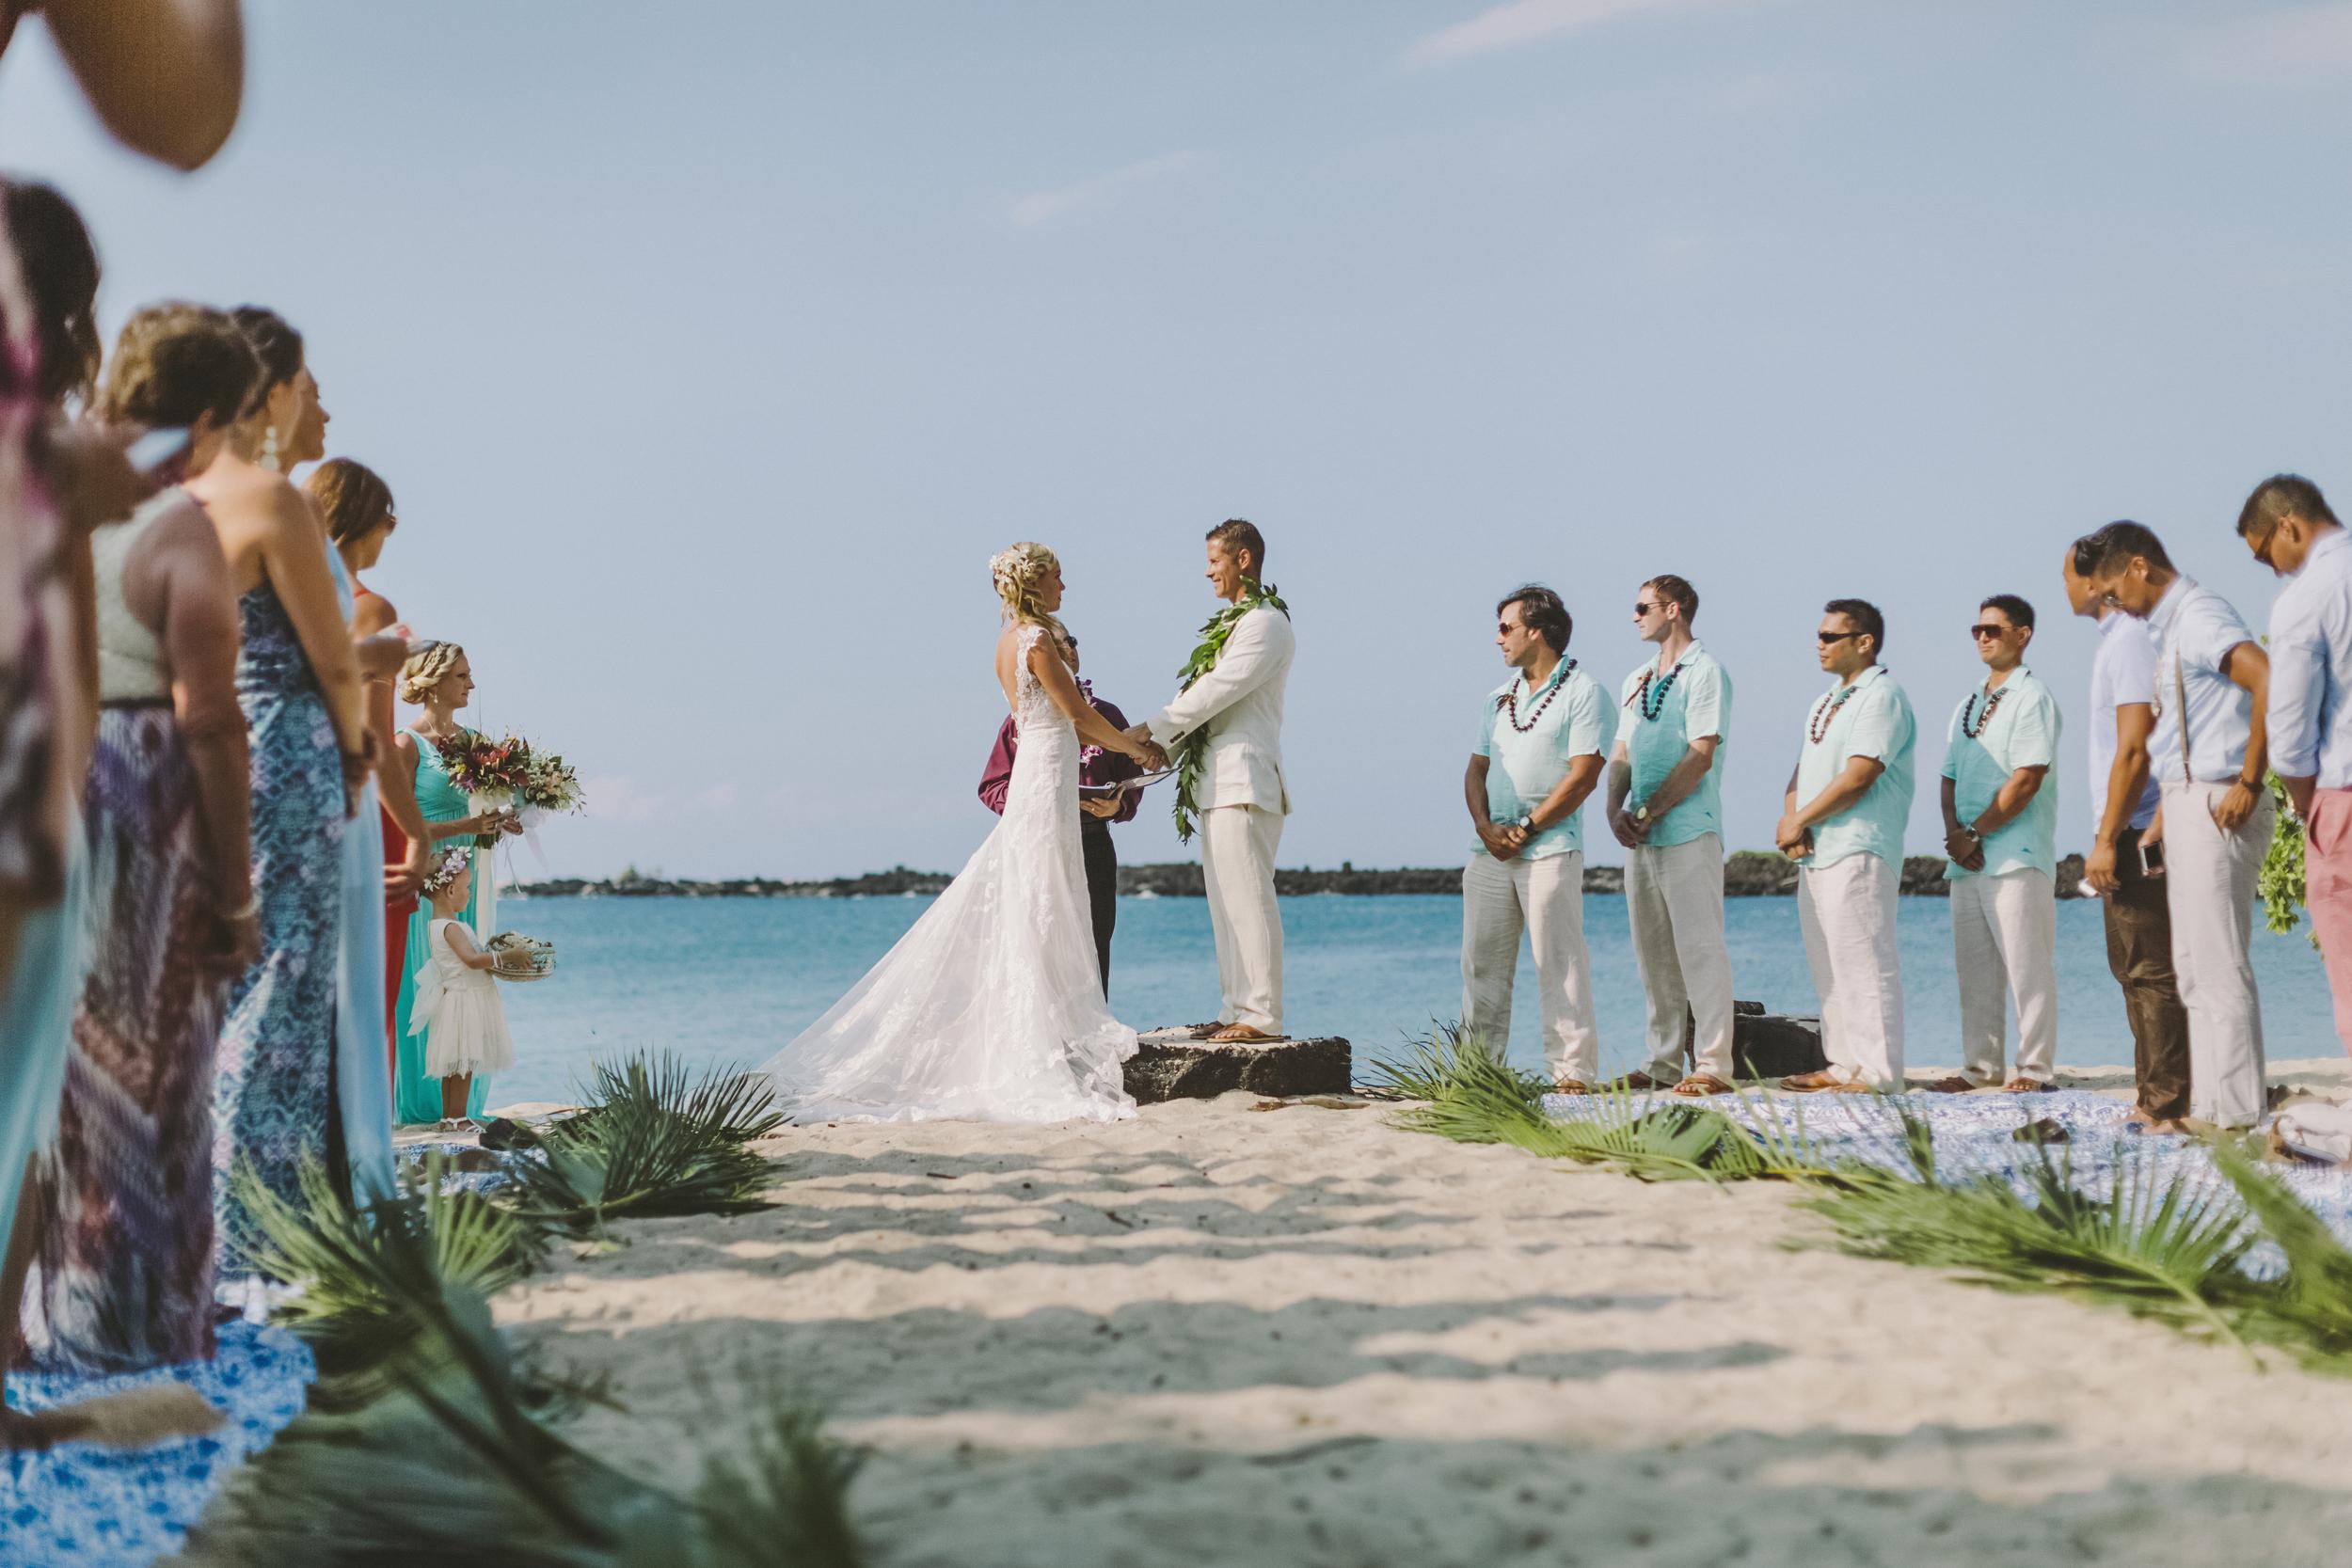 angie-diaz-photography-hawaii-wedding-photographer-kelli-jay-58.jpg